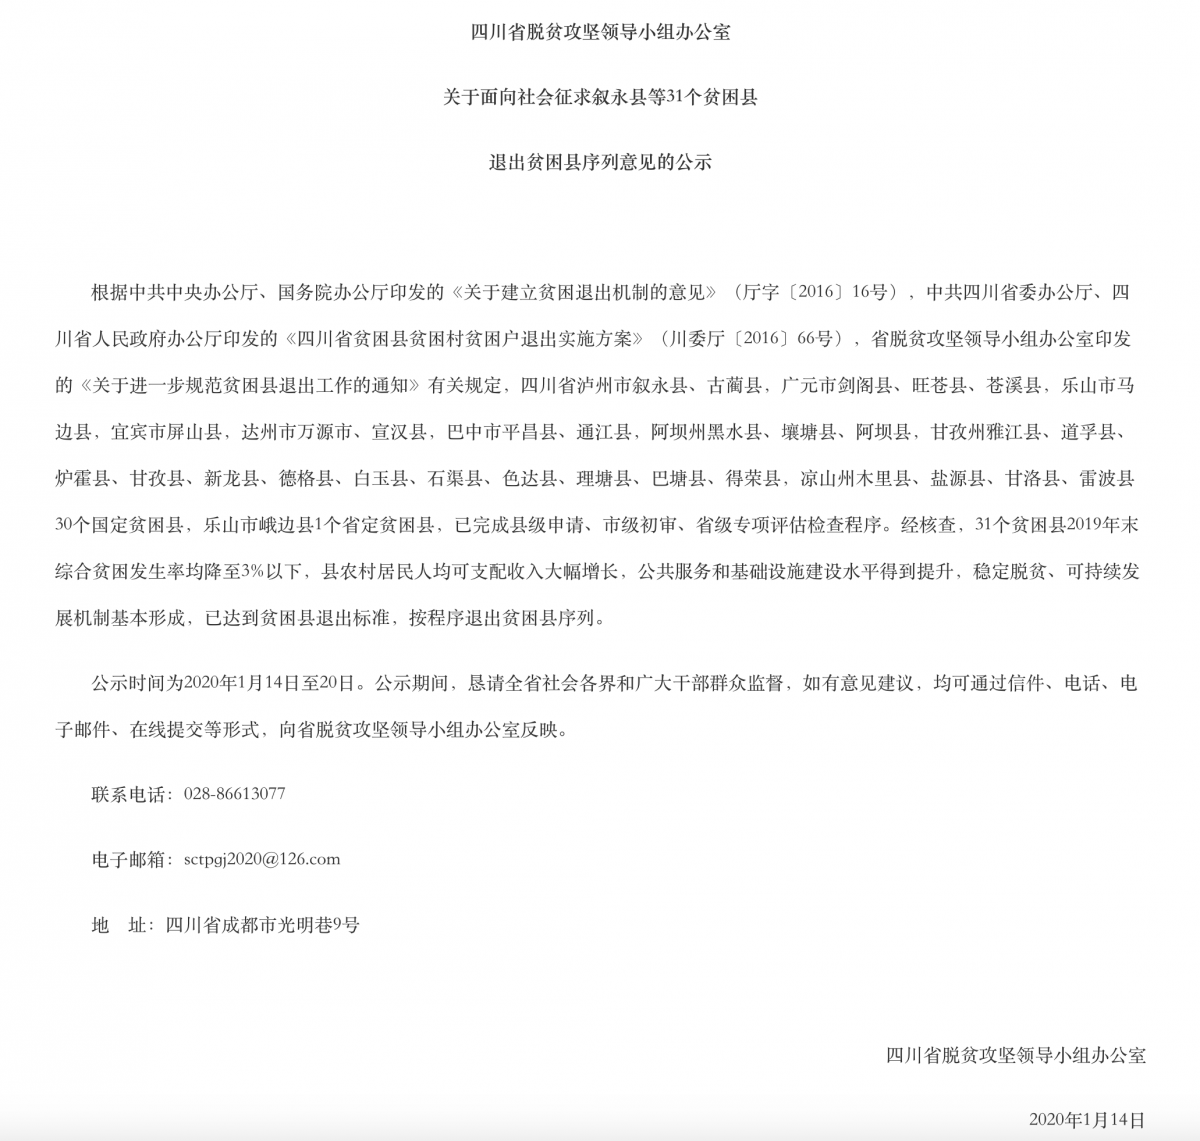 http://www.edaojz.cn/qichexingye/434027.html